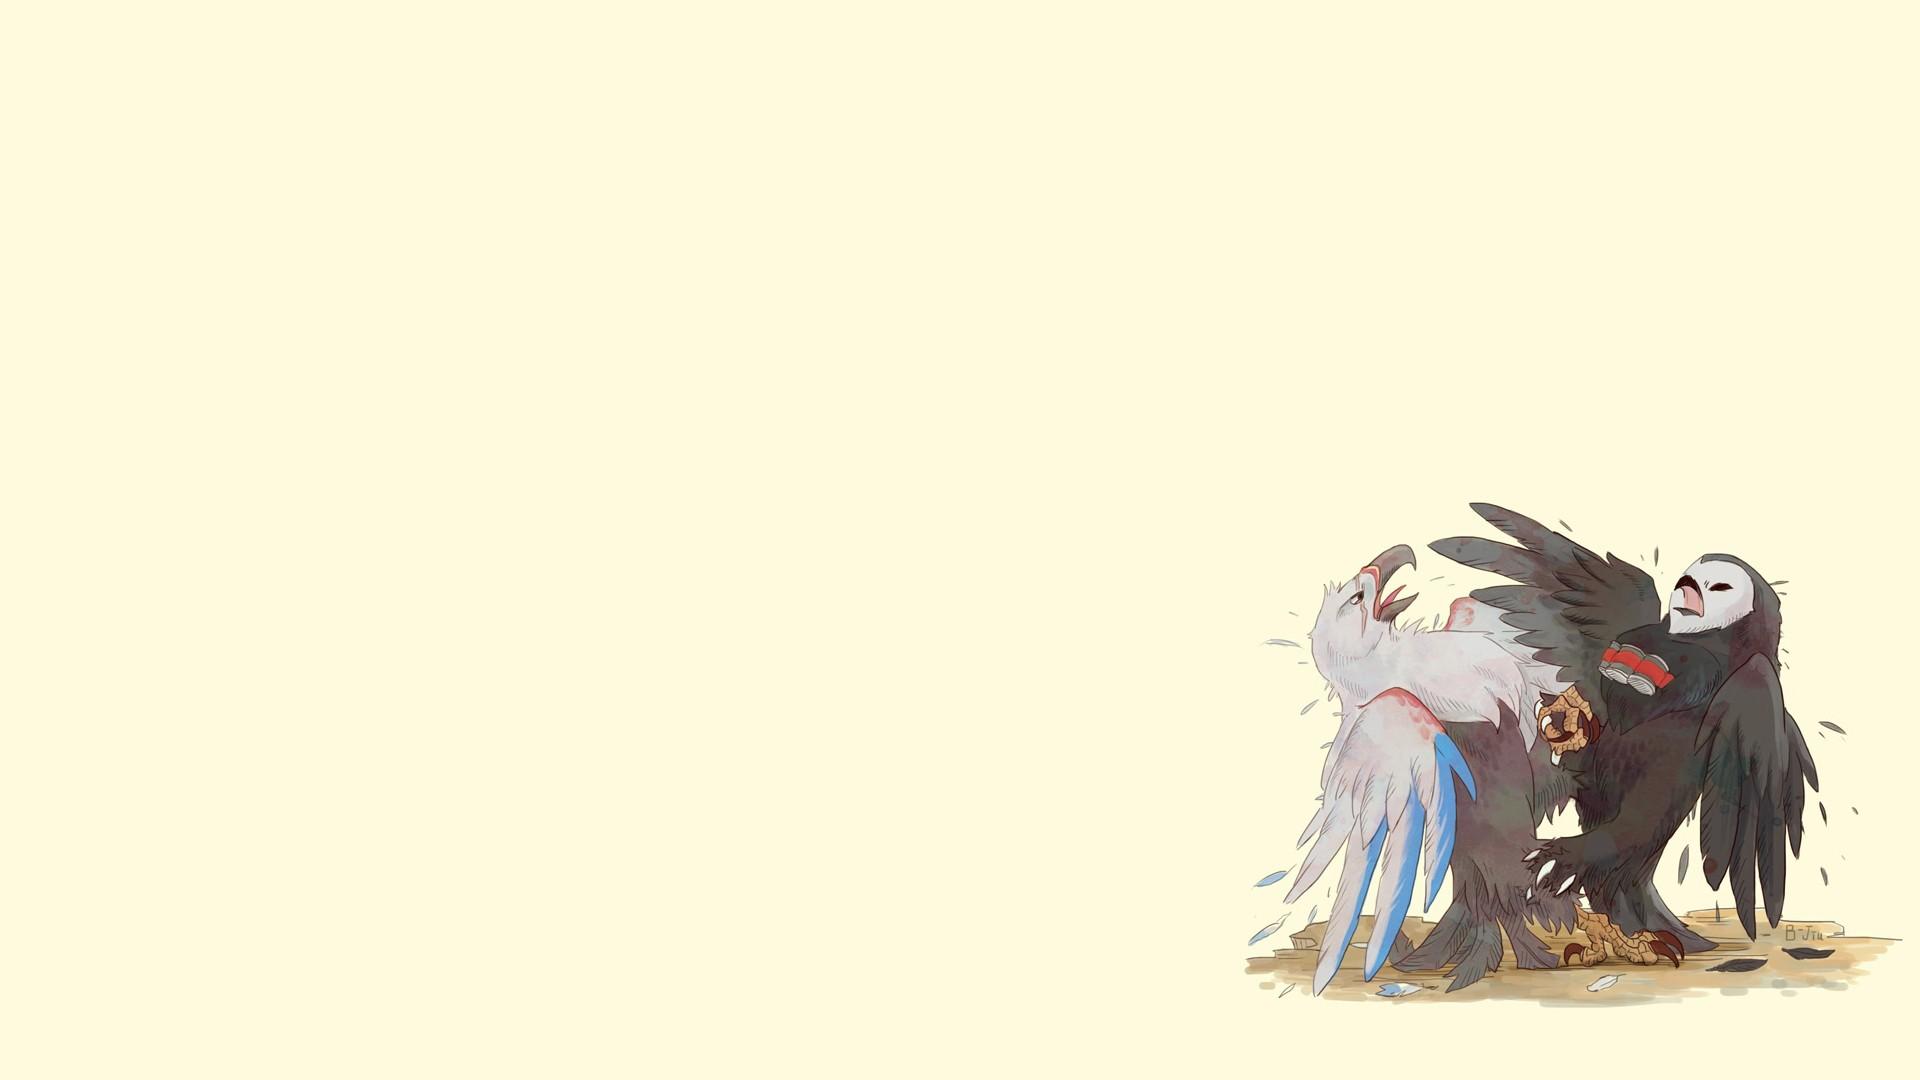 Sfondi uccelli anime cartone animato overwatch reaper